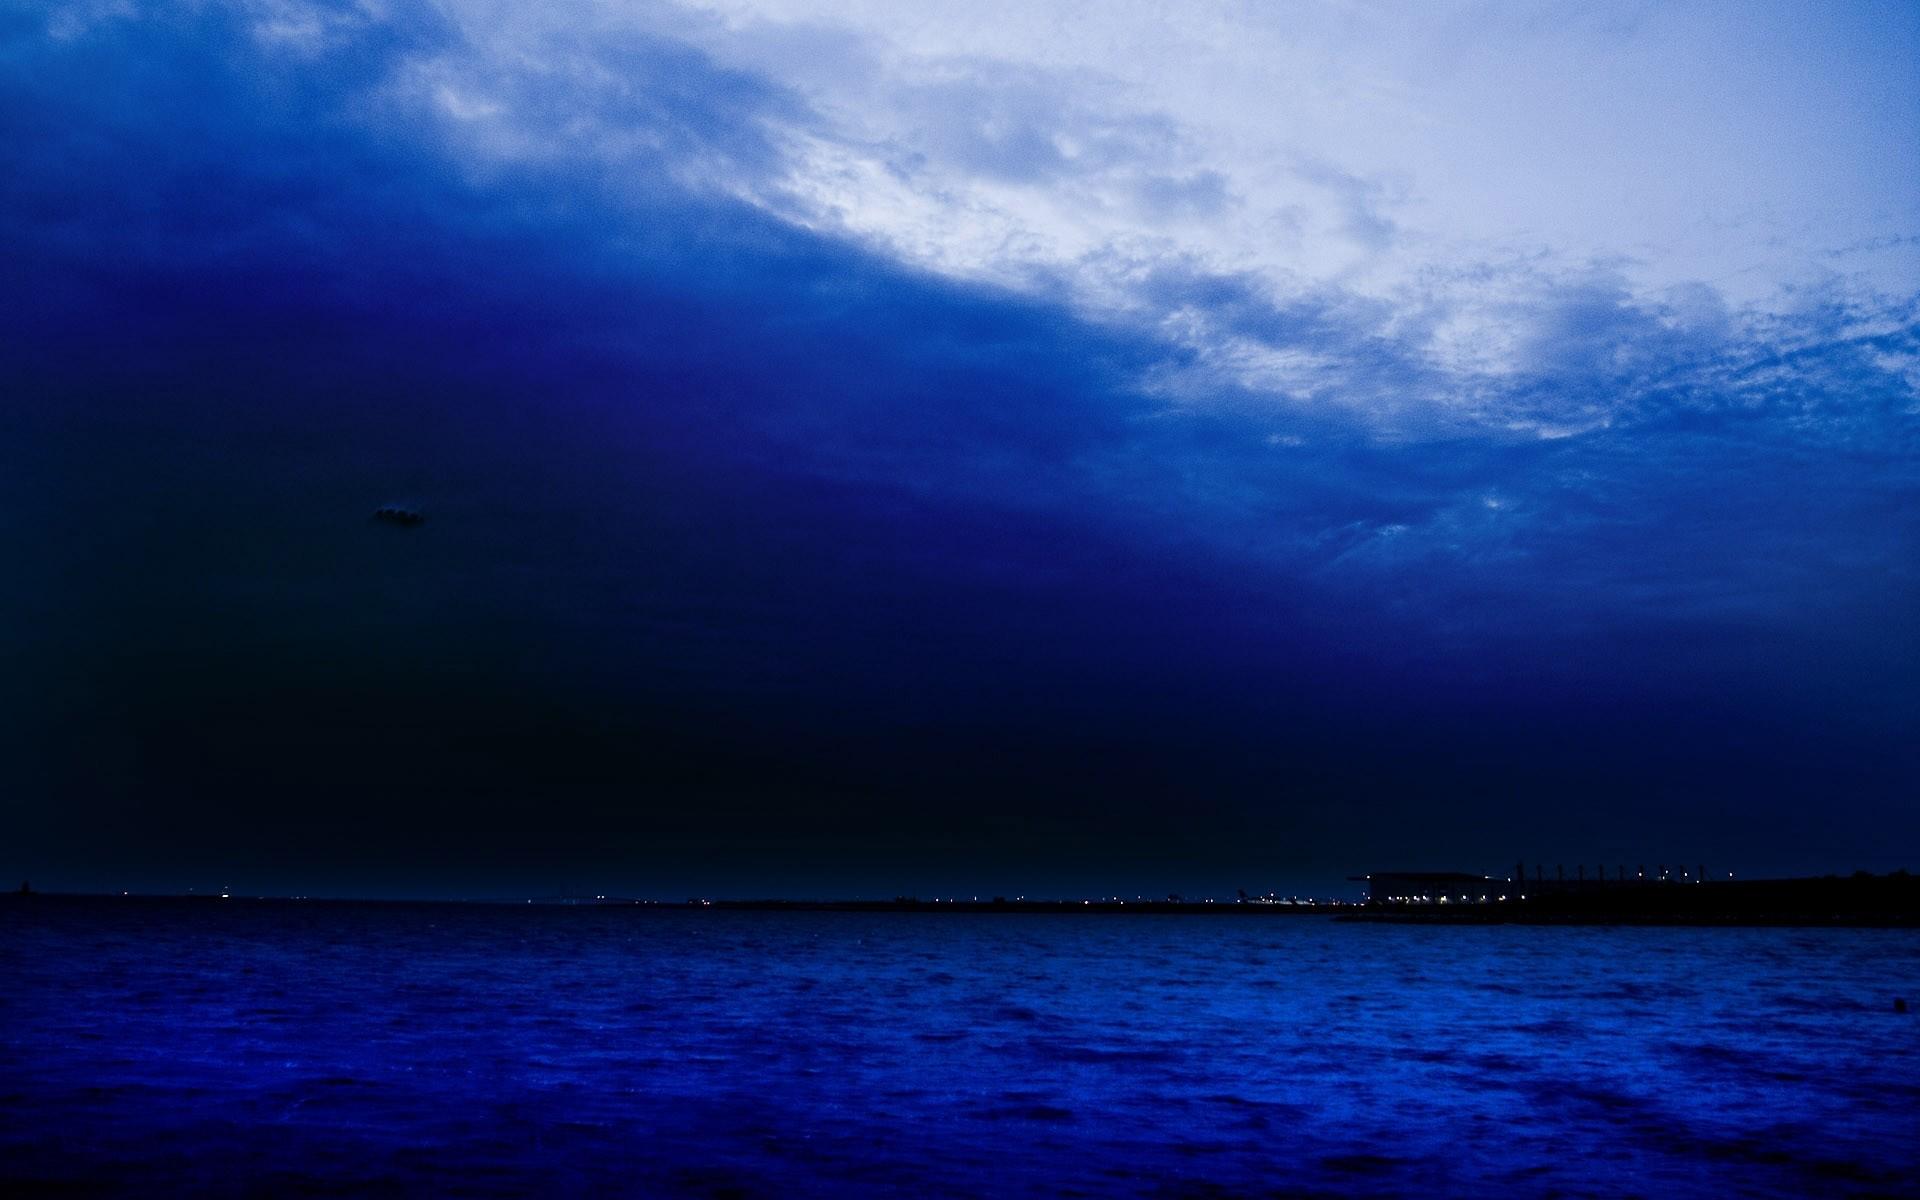 Landscapes lakes sea ocean coast shore night lights sky clouds wallpaper      34239   WallpaperUP